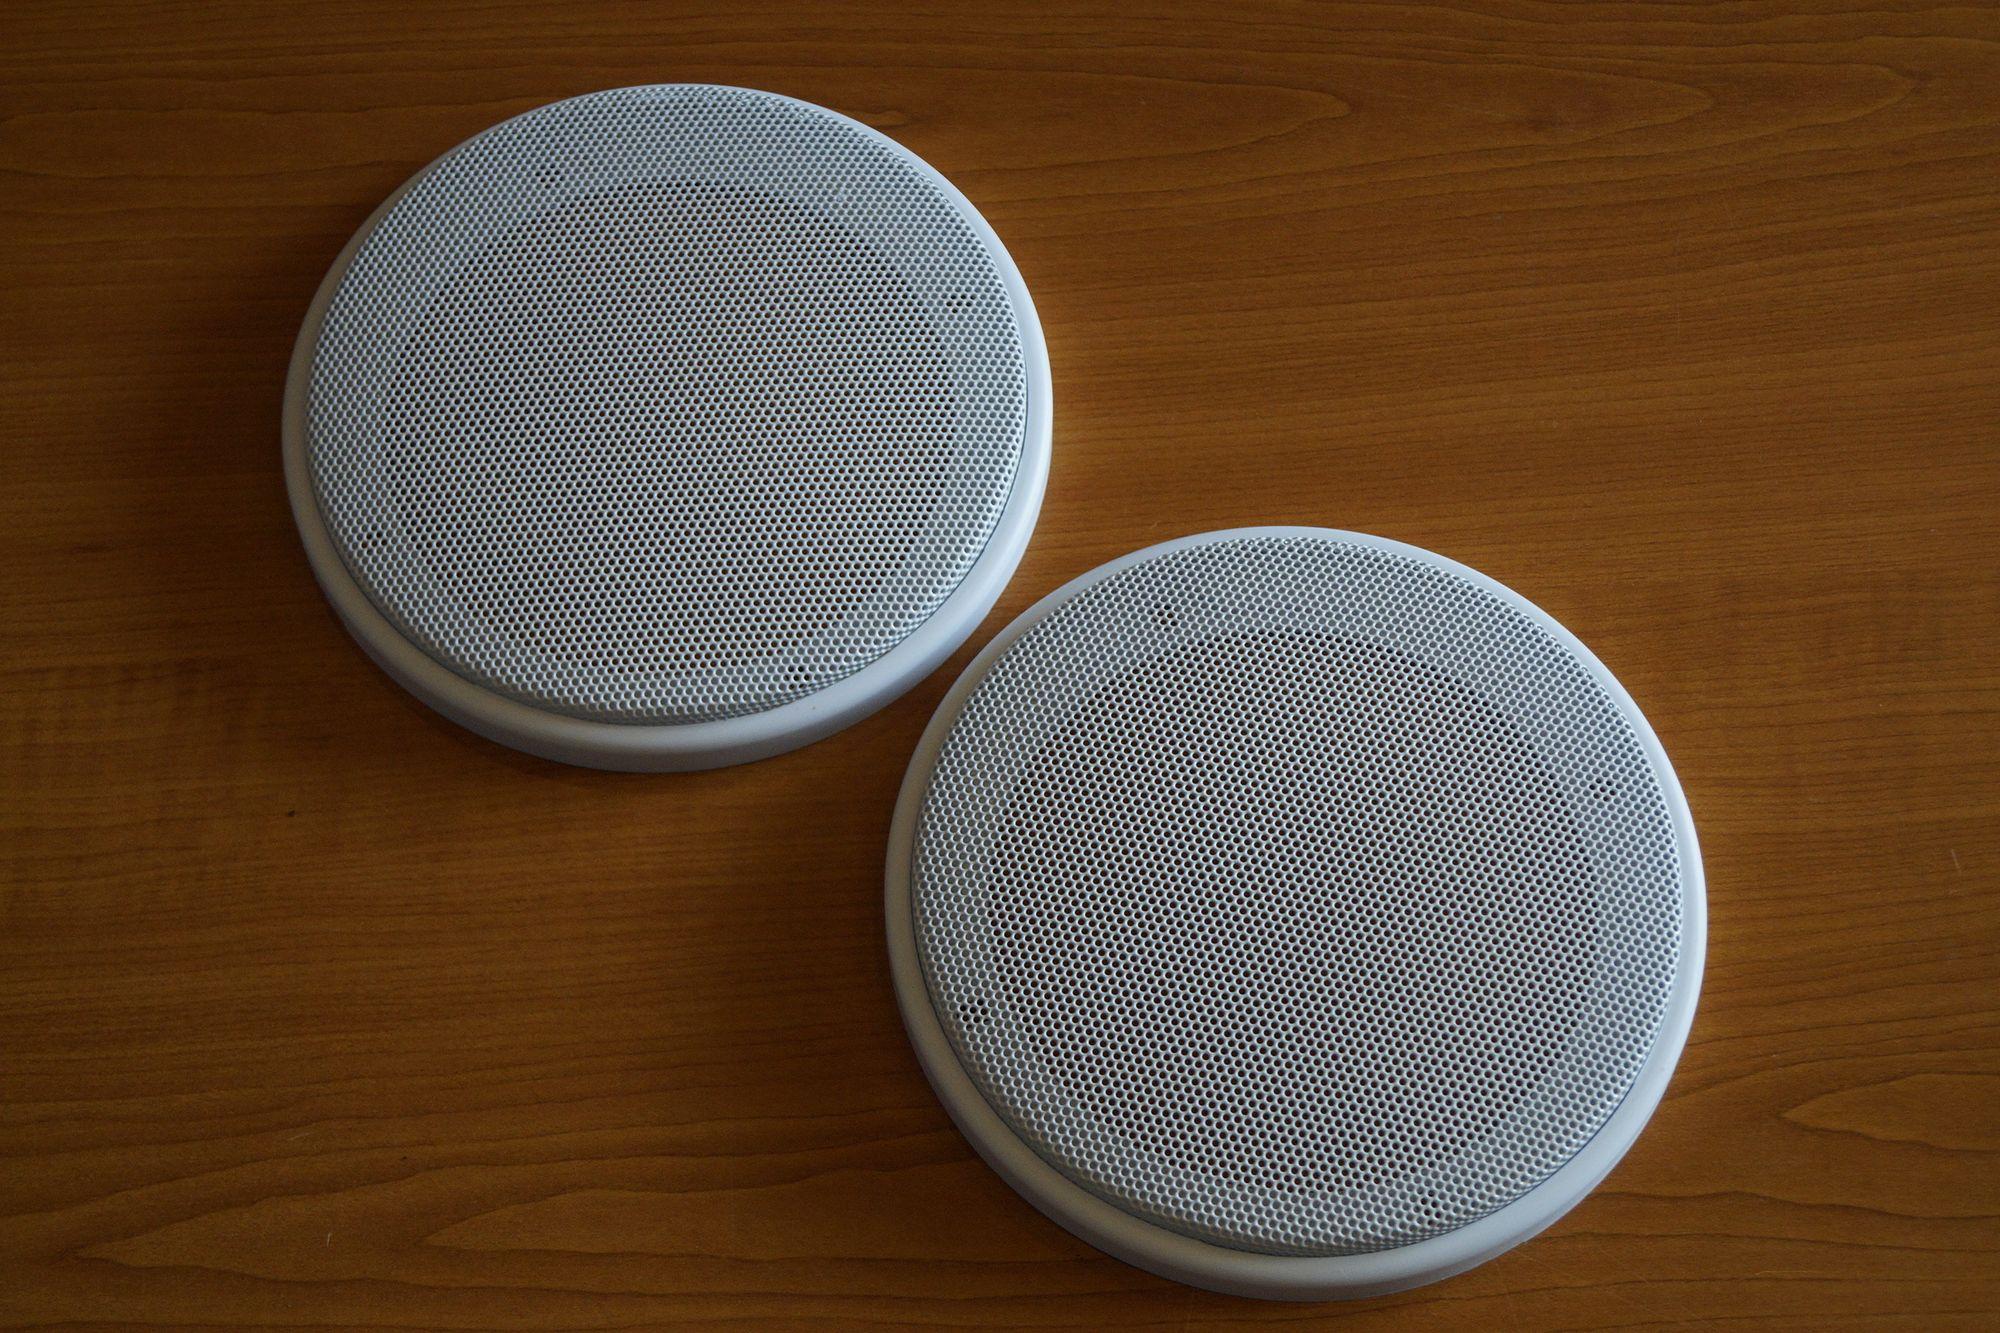 1 Paar DIN-160 Lautsprecher-Universalabdeckung Abdeckung Gitter weiß